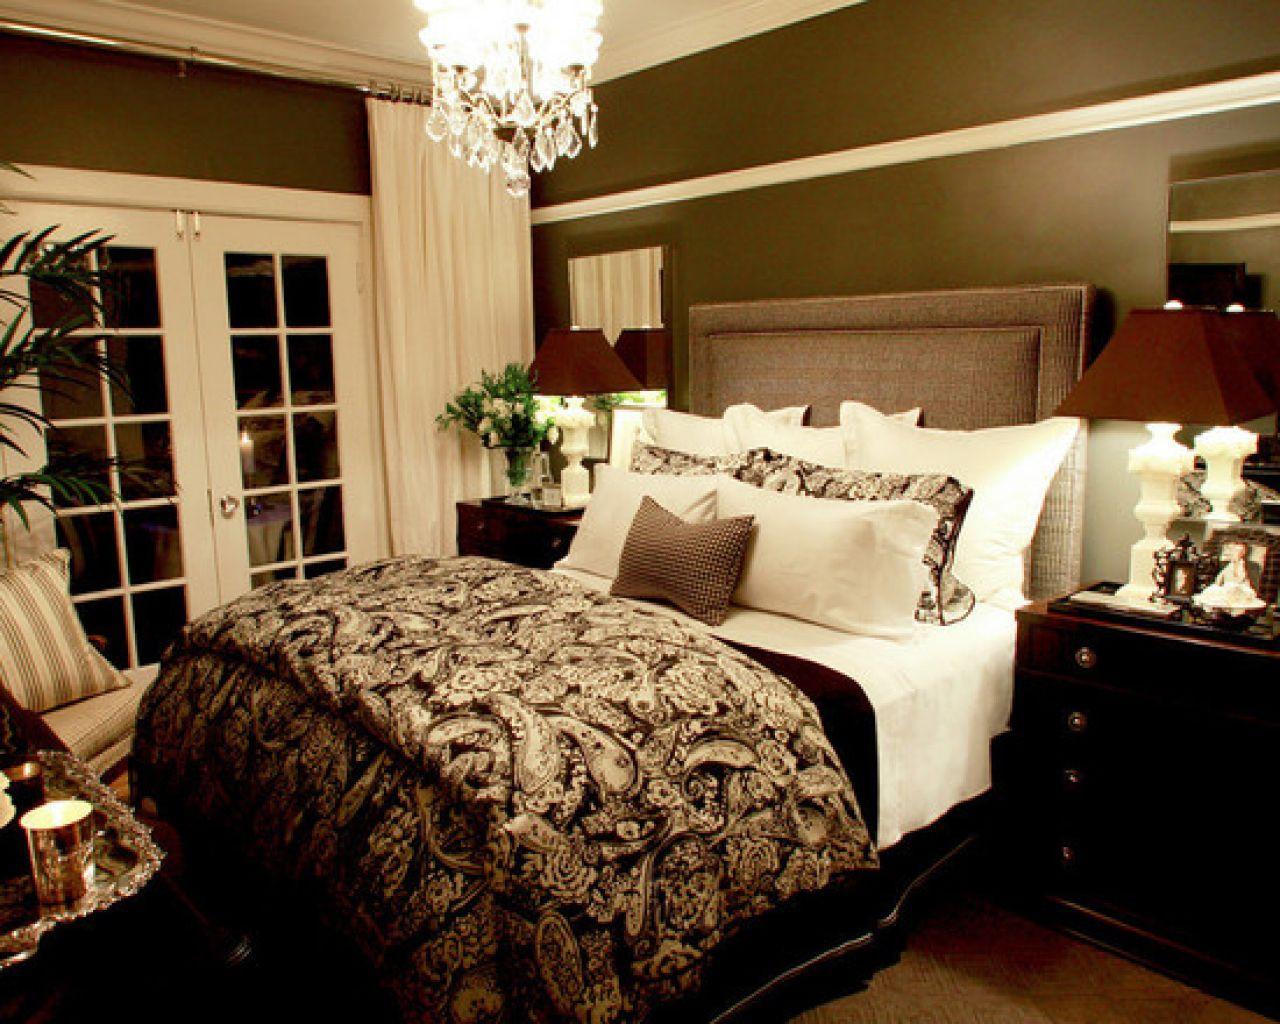 Romantic Bedroom Decor Ideas  Apply Romantic Bedroom Ideas for Romantic Couple MidCityEast